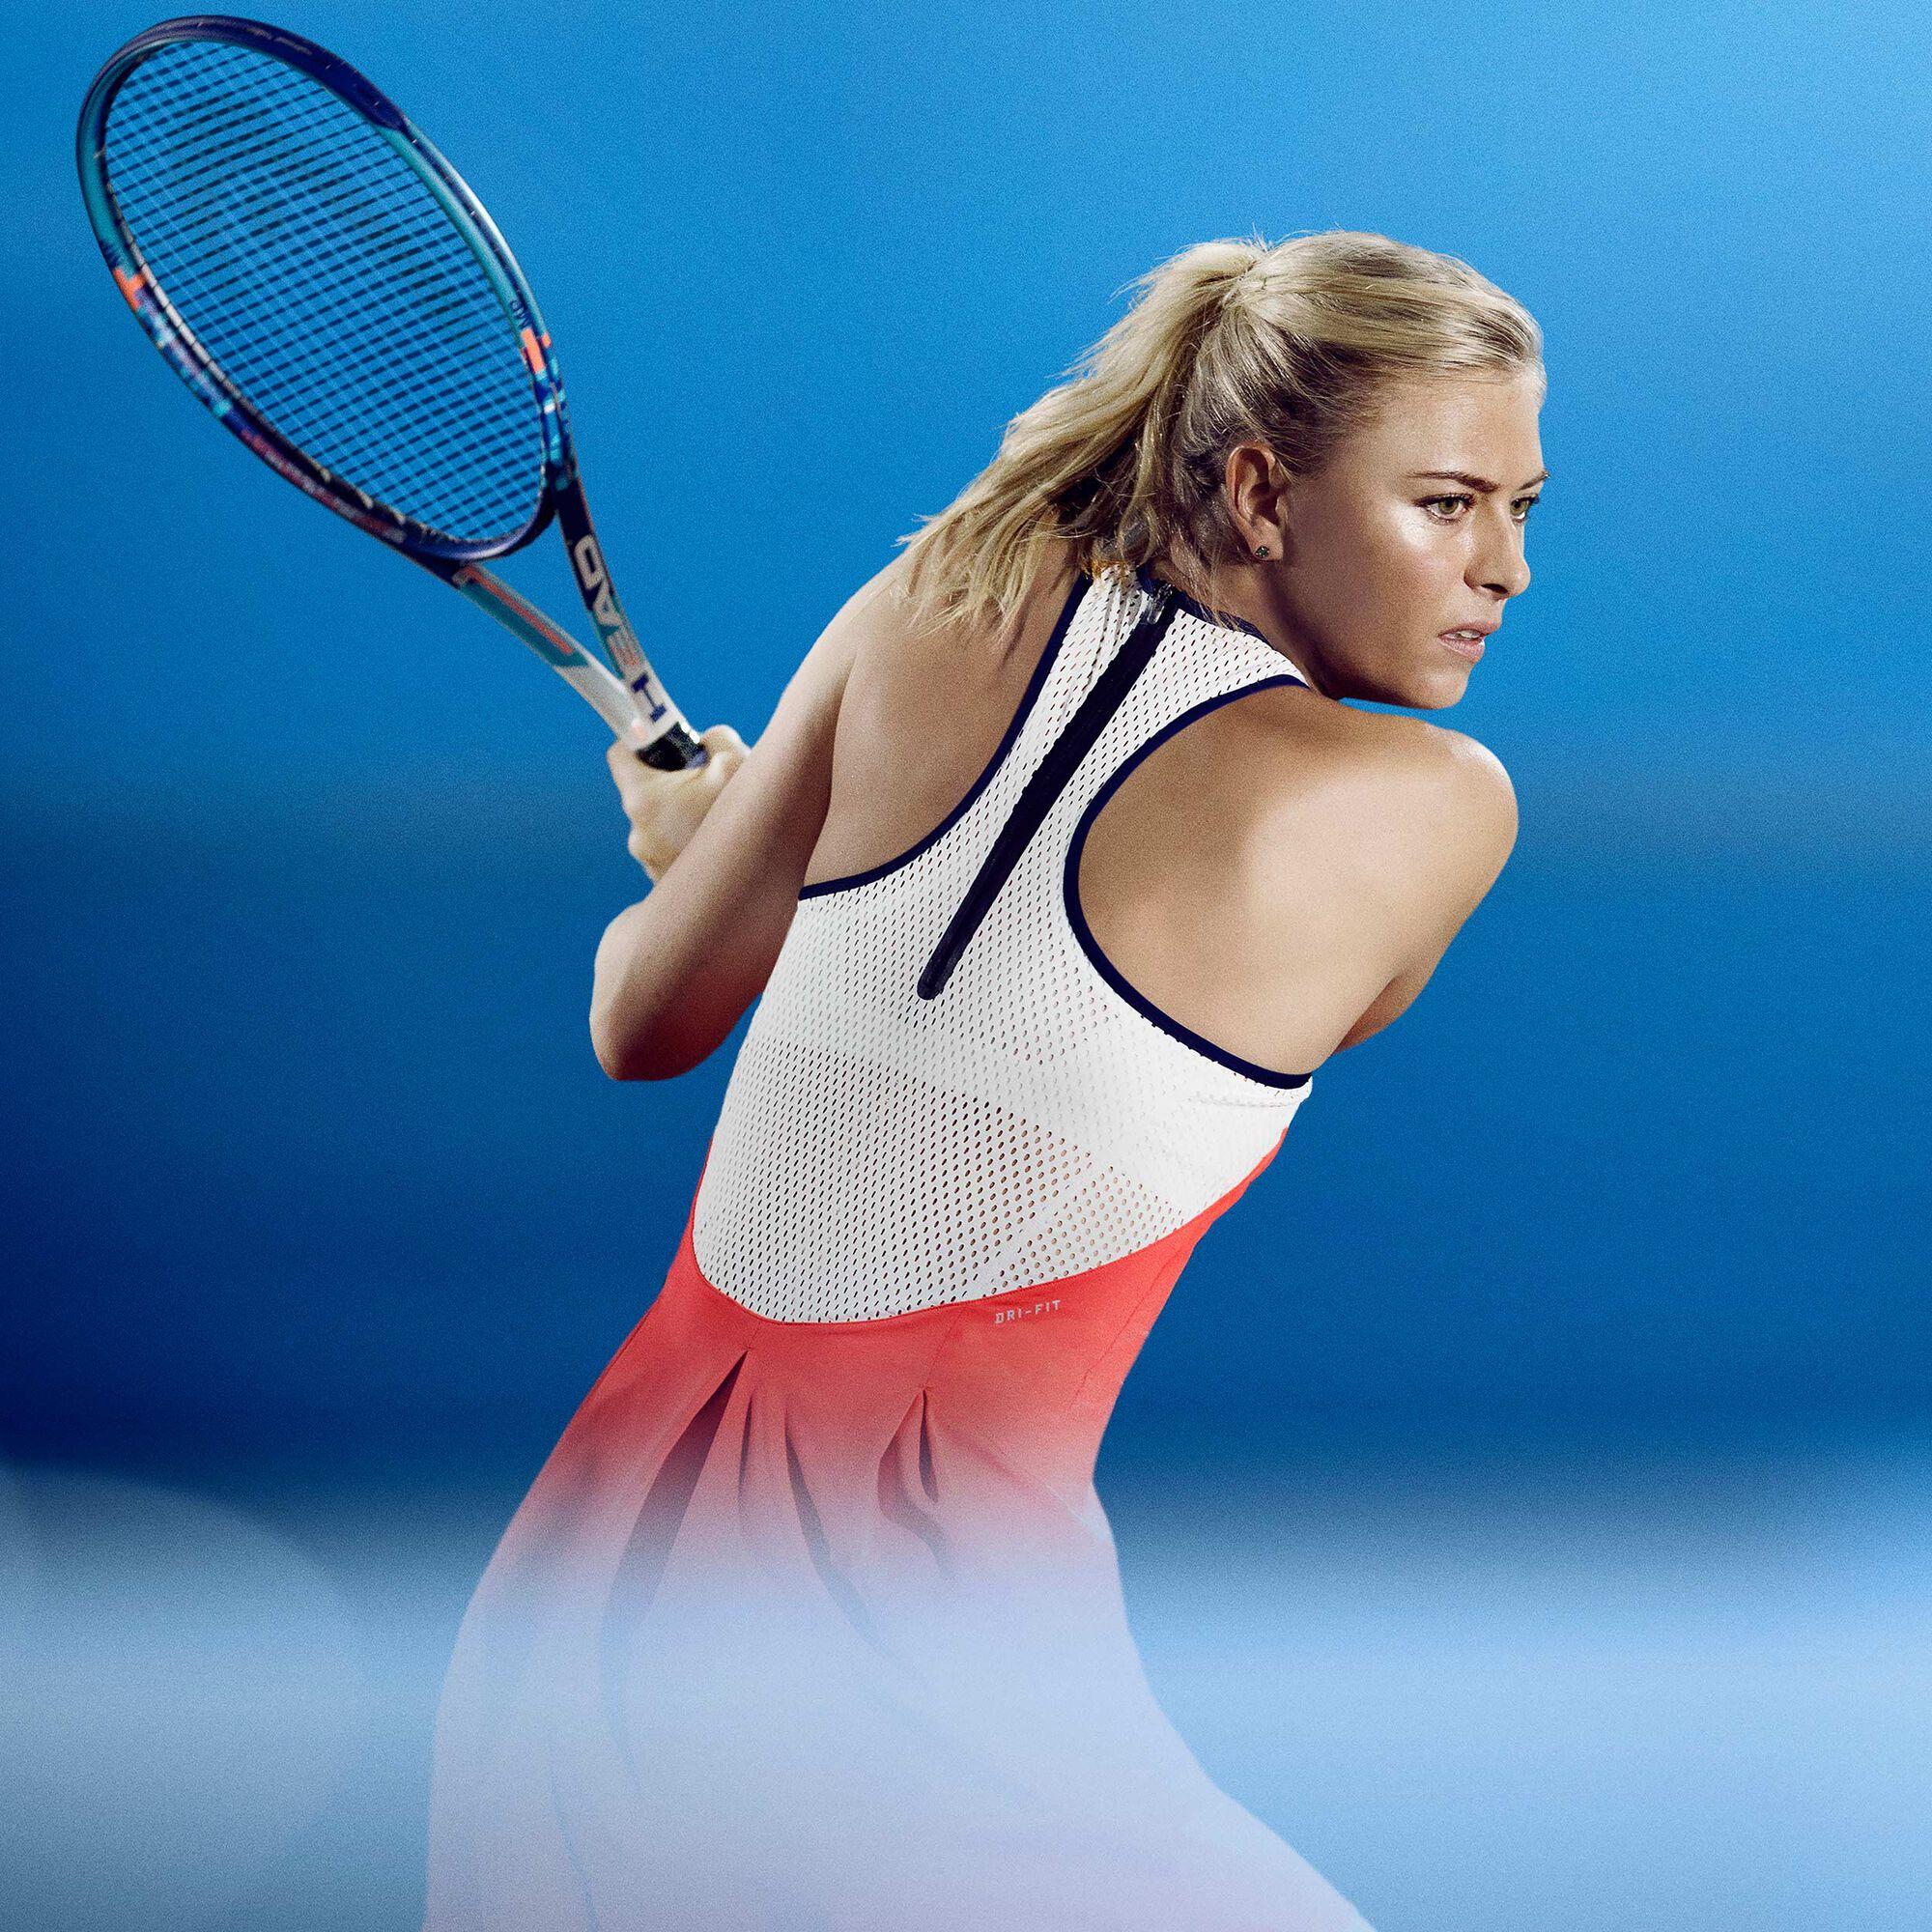 Galaxia estas sonriendo  Nike Maria Sharapova Premier Vestido Mujeres - Naranja Neón, Blanco compra  online | Tennis-Point